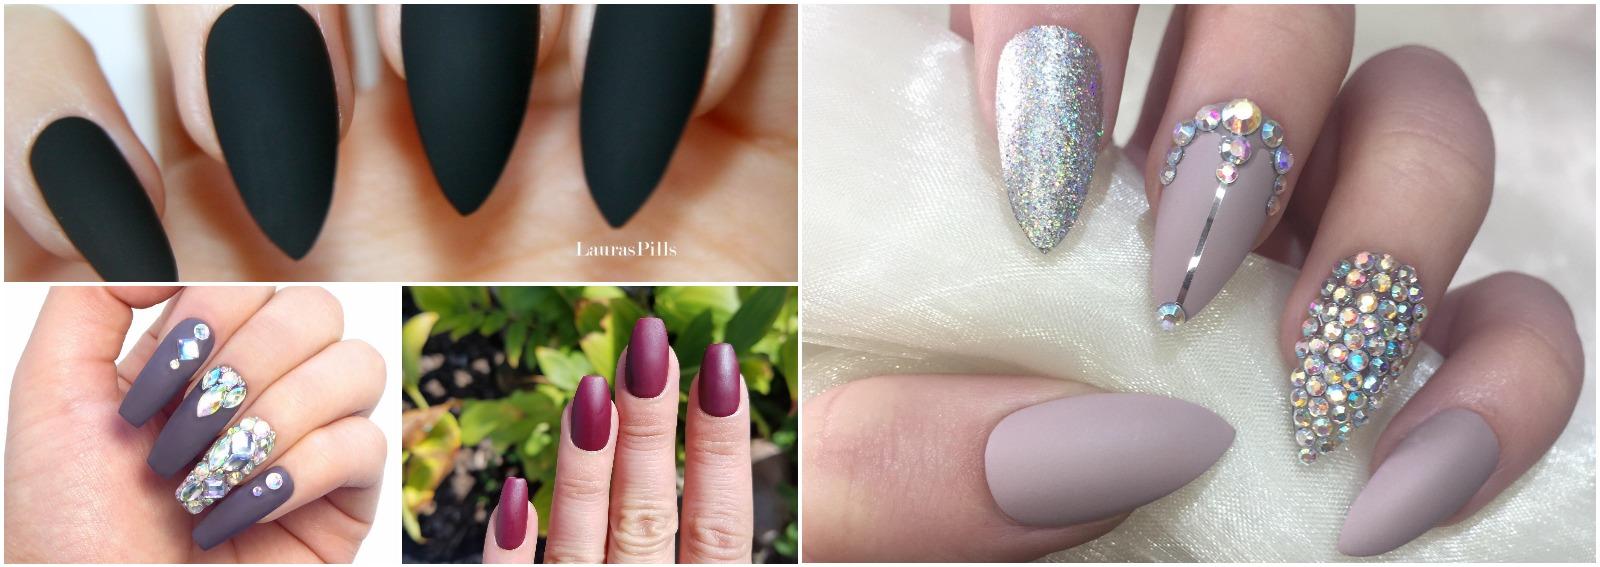 velvet-nails-unghie-opache-nail-art-matt-idee-foto-cover-desktop